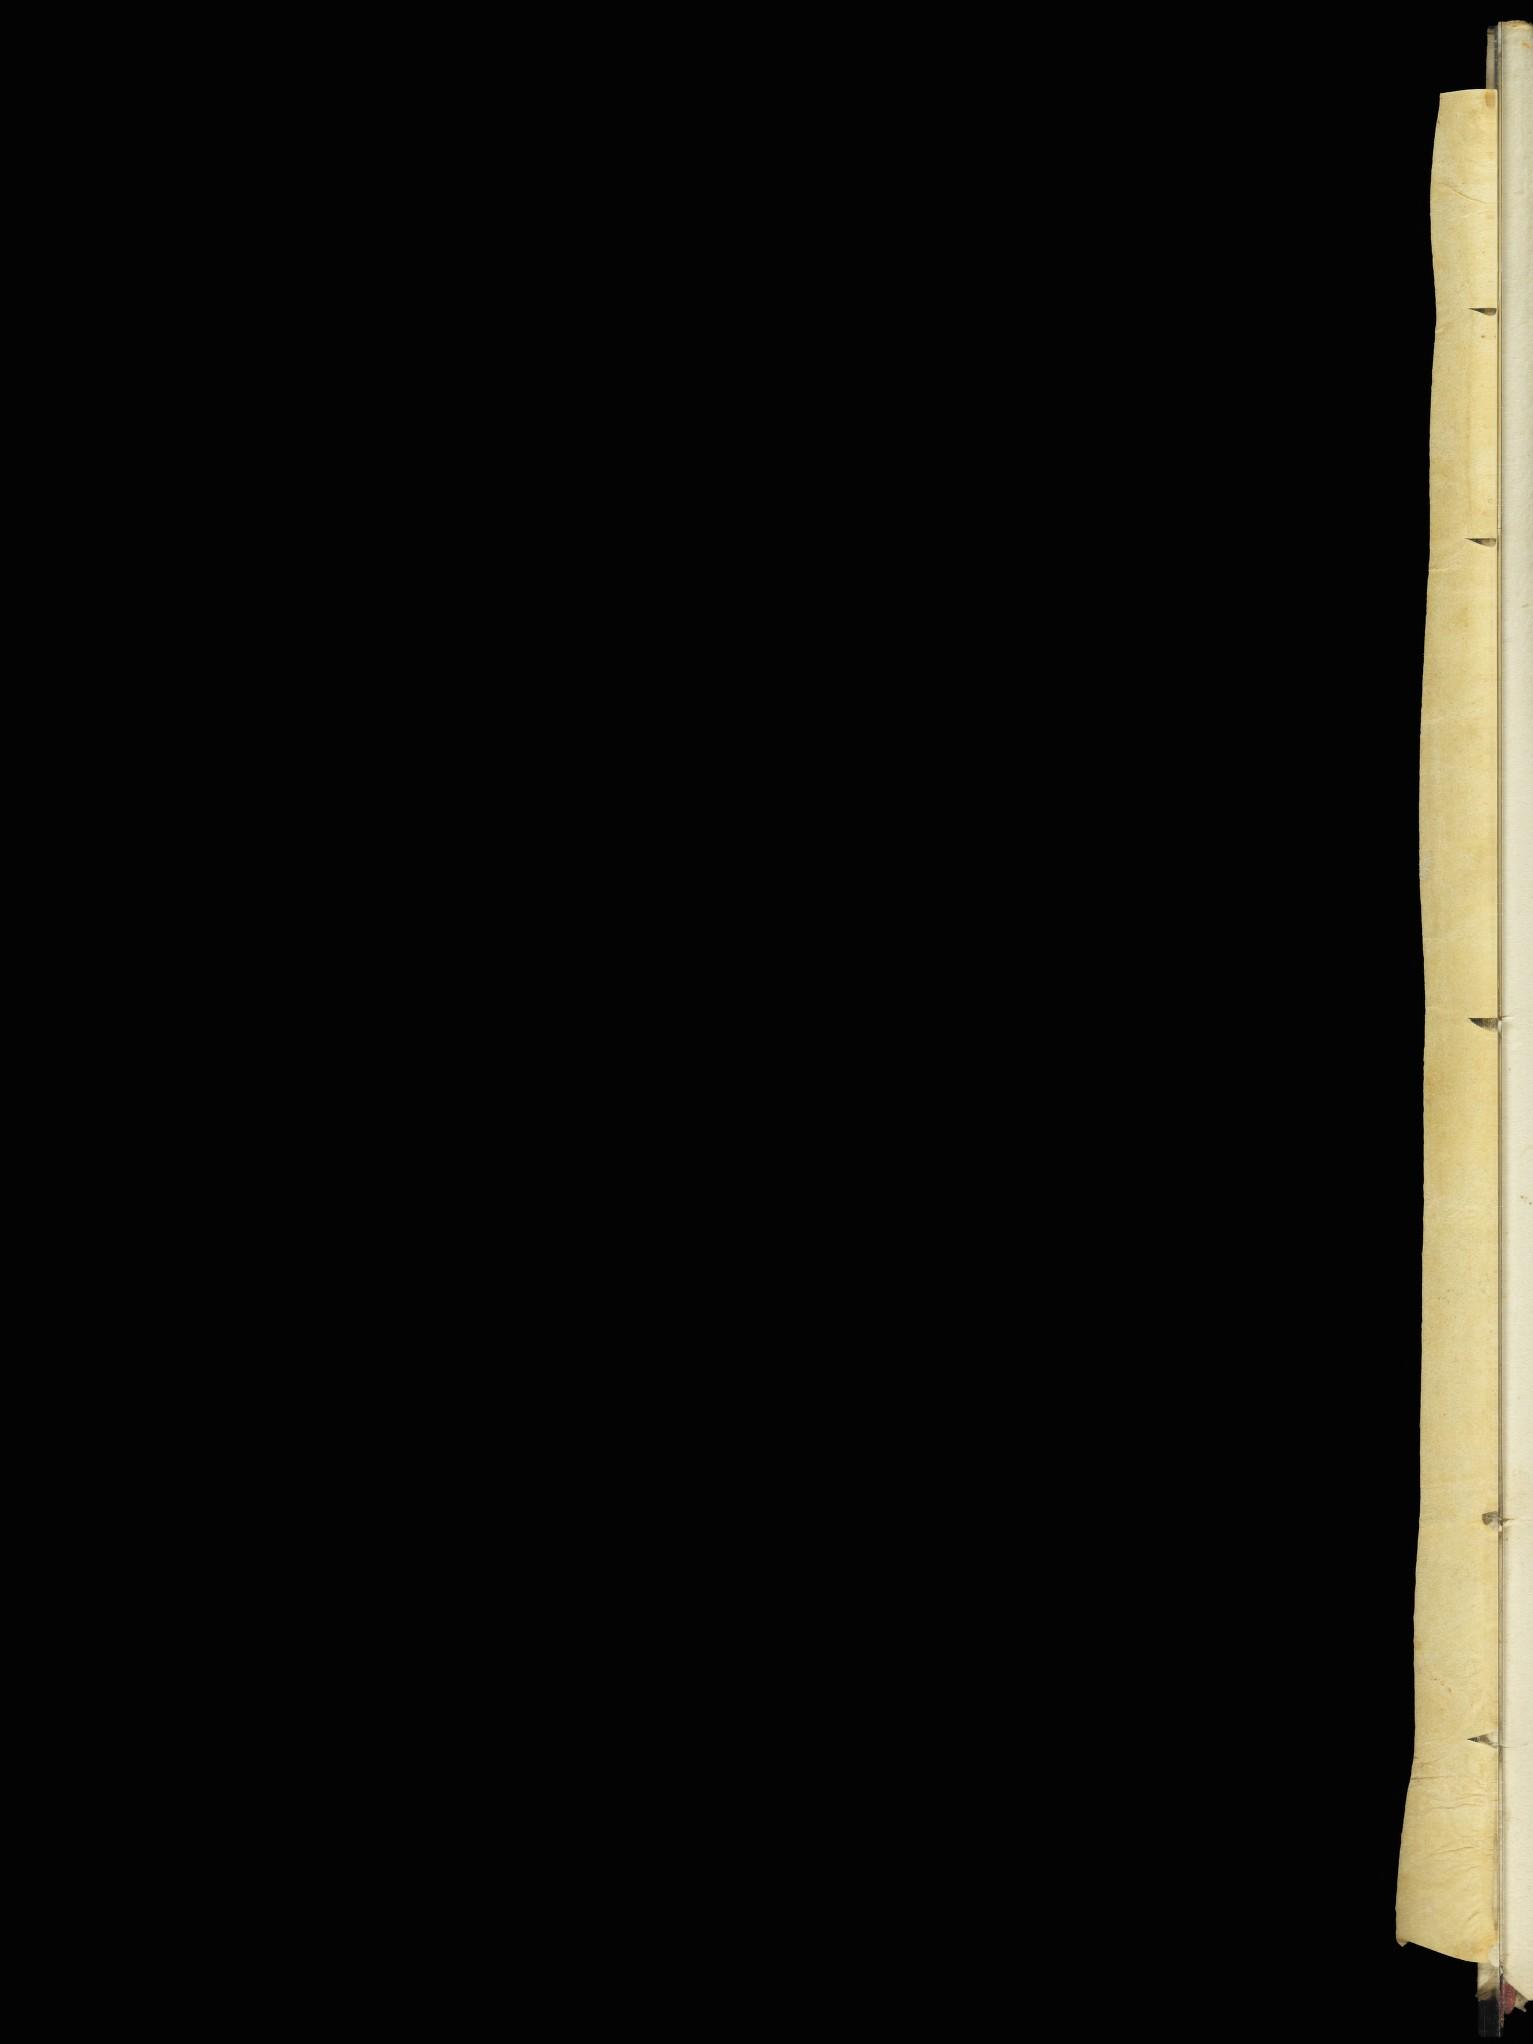 376-s003